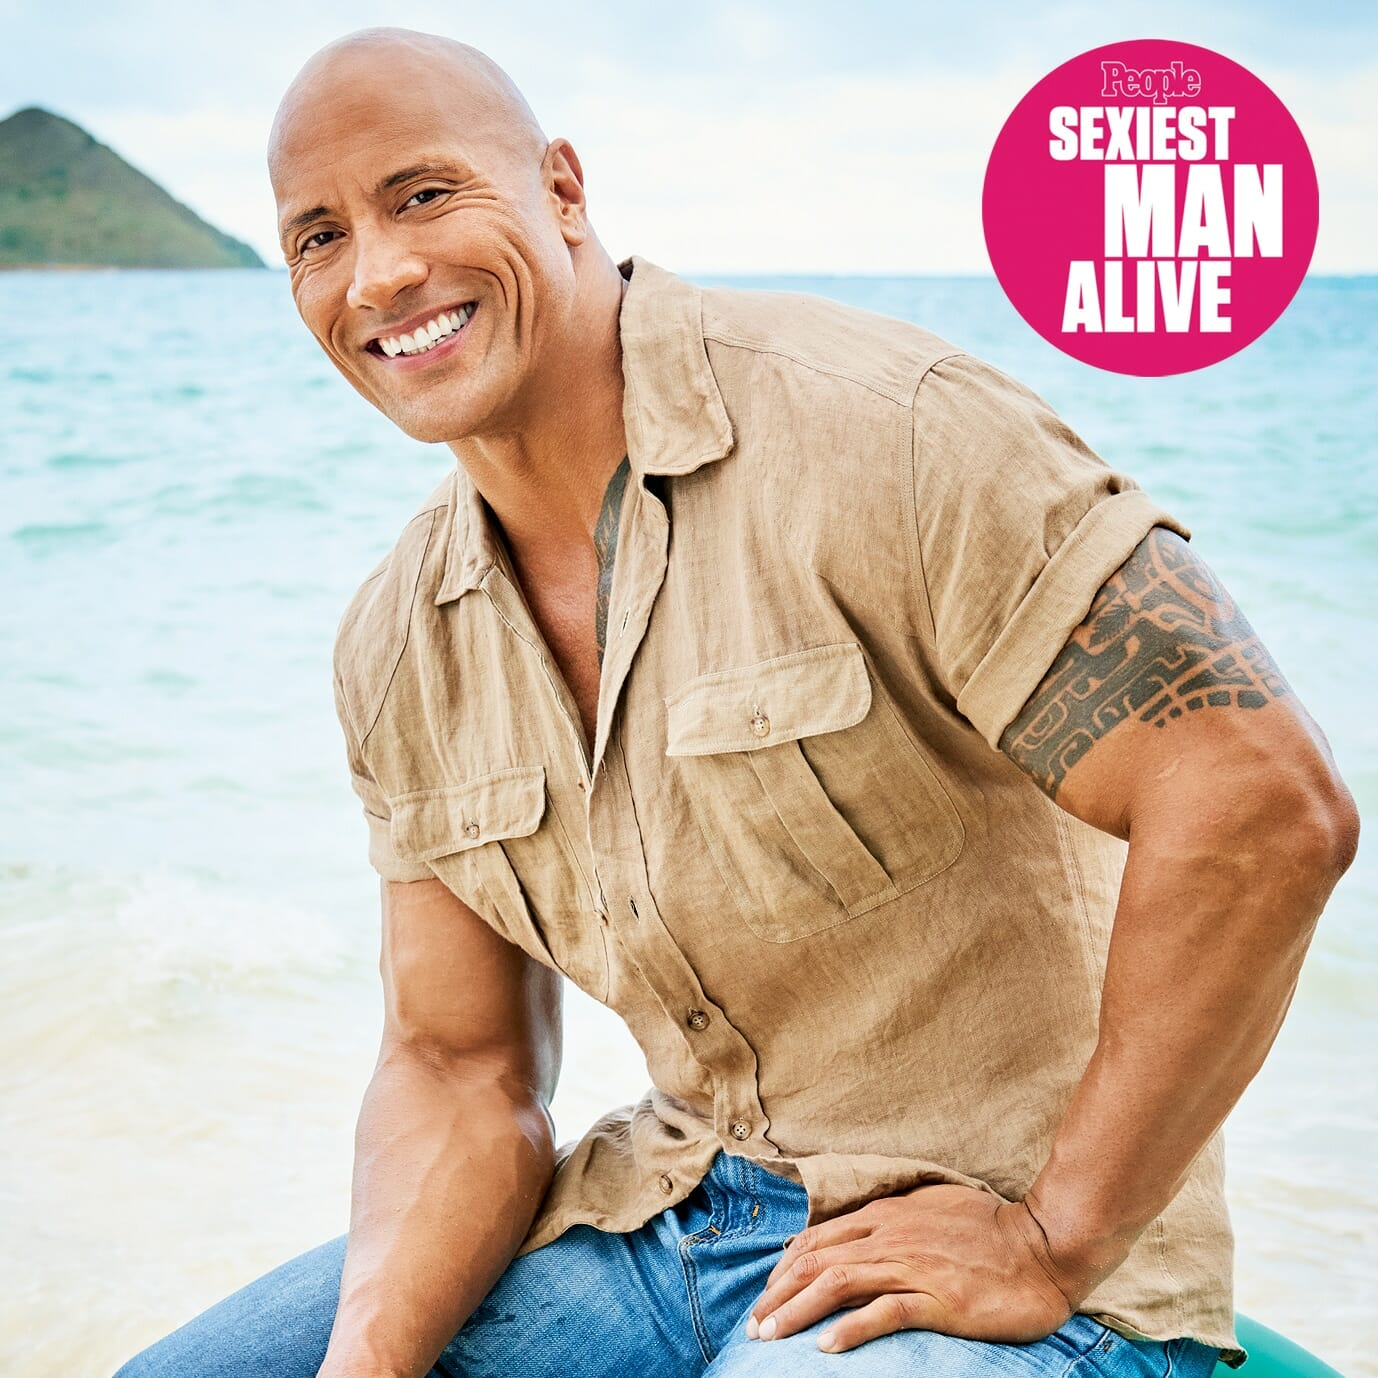 The Rock Dwayne Johnson posing